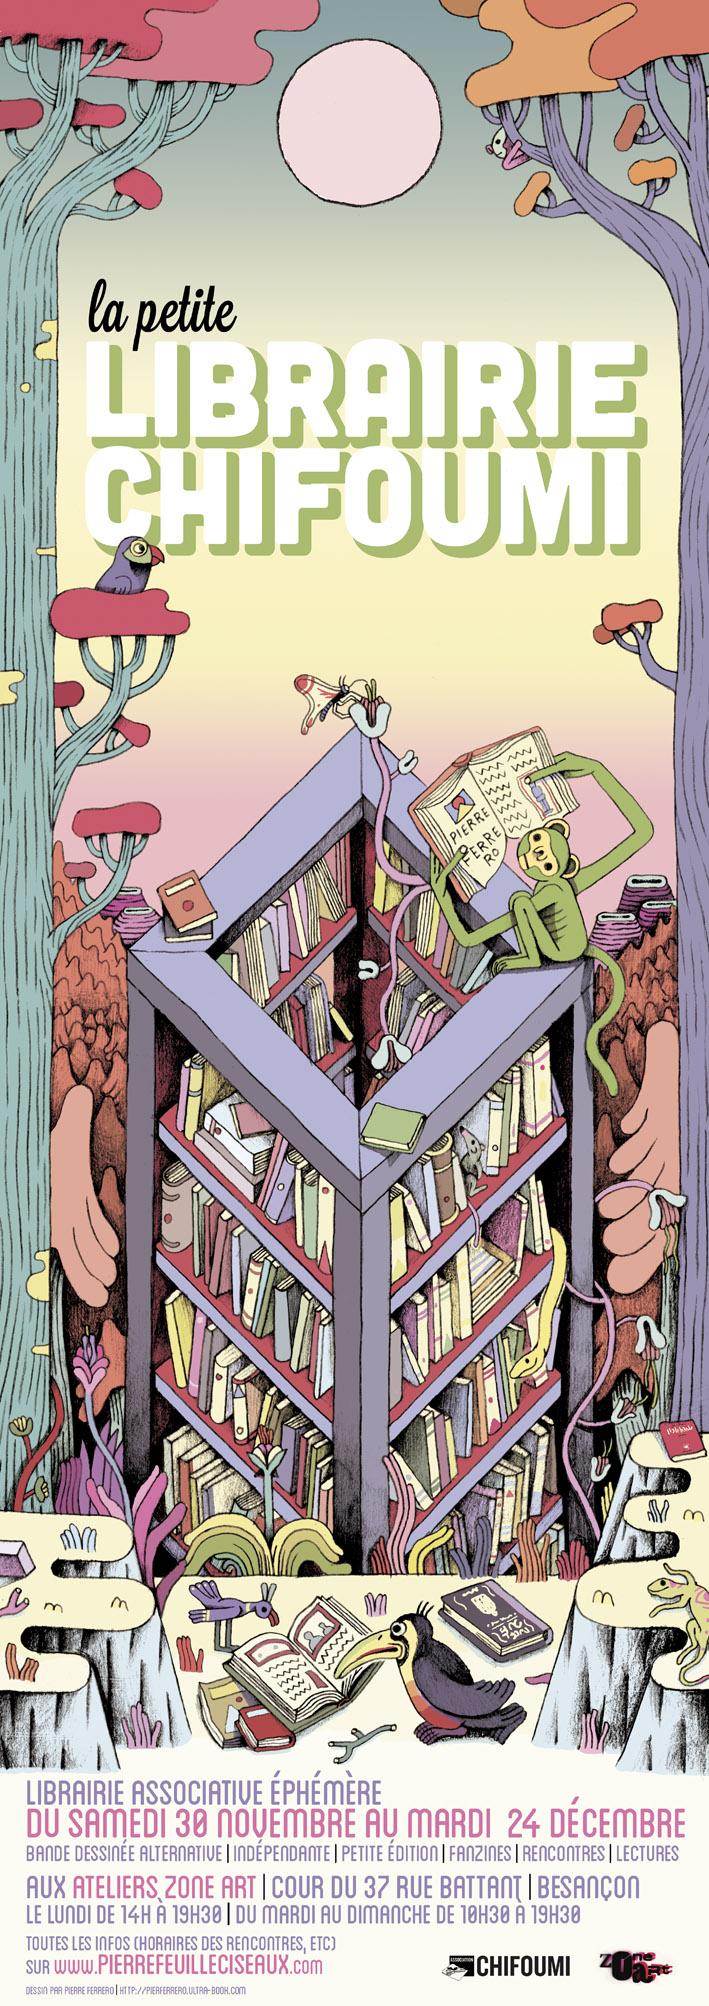 Petite Librairie Ephémère - © Pierre Ferrero